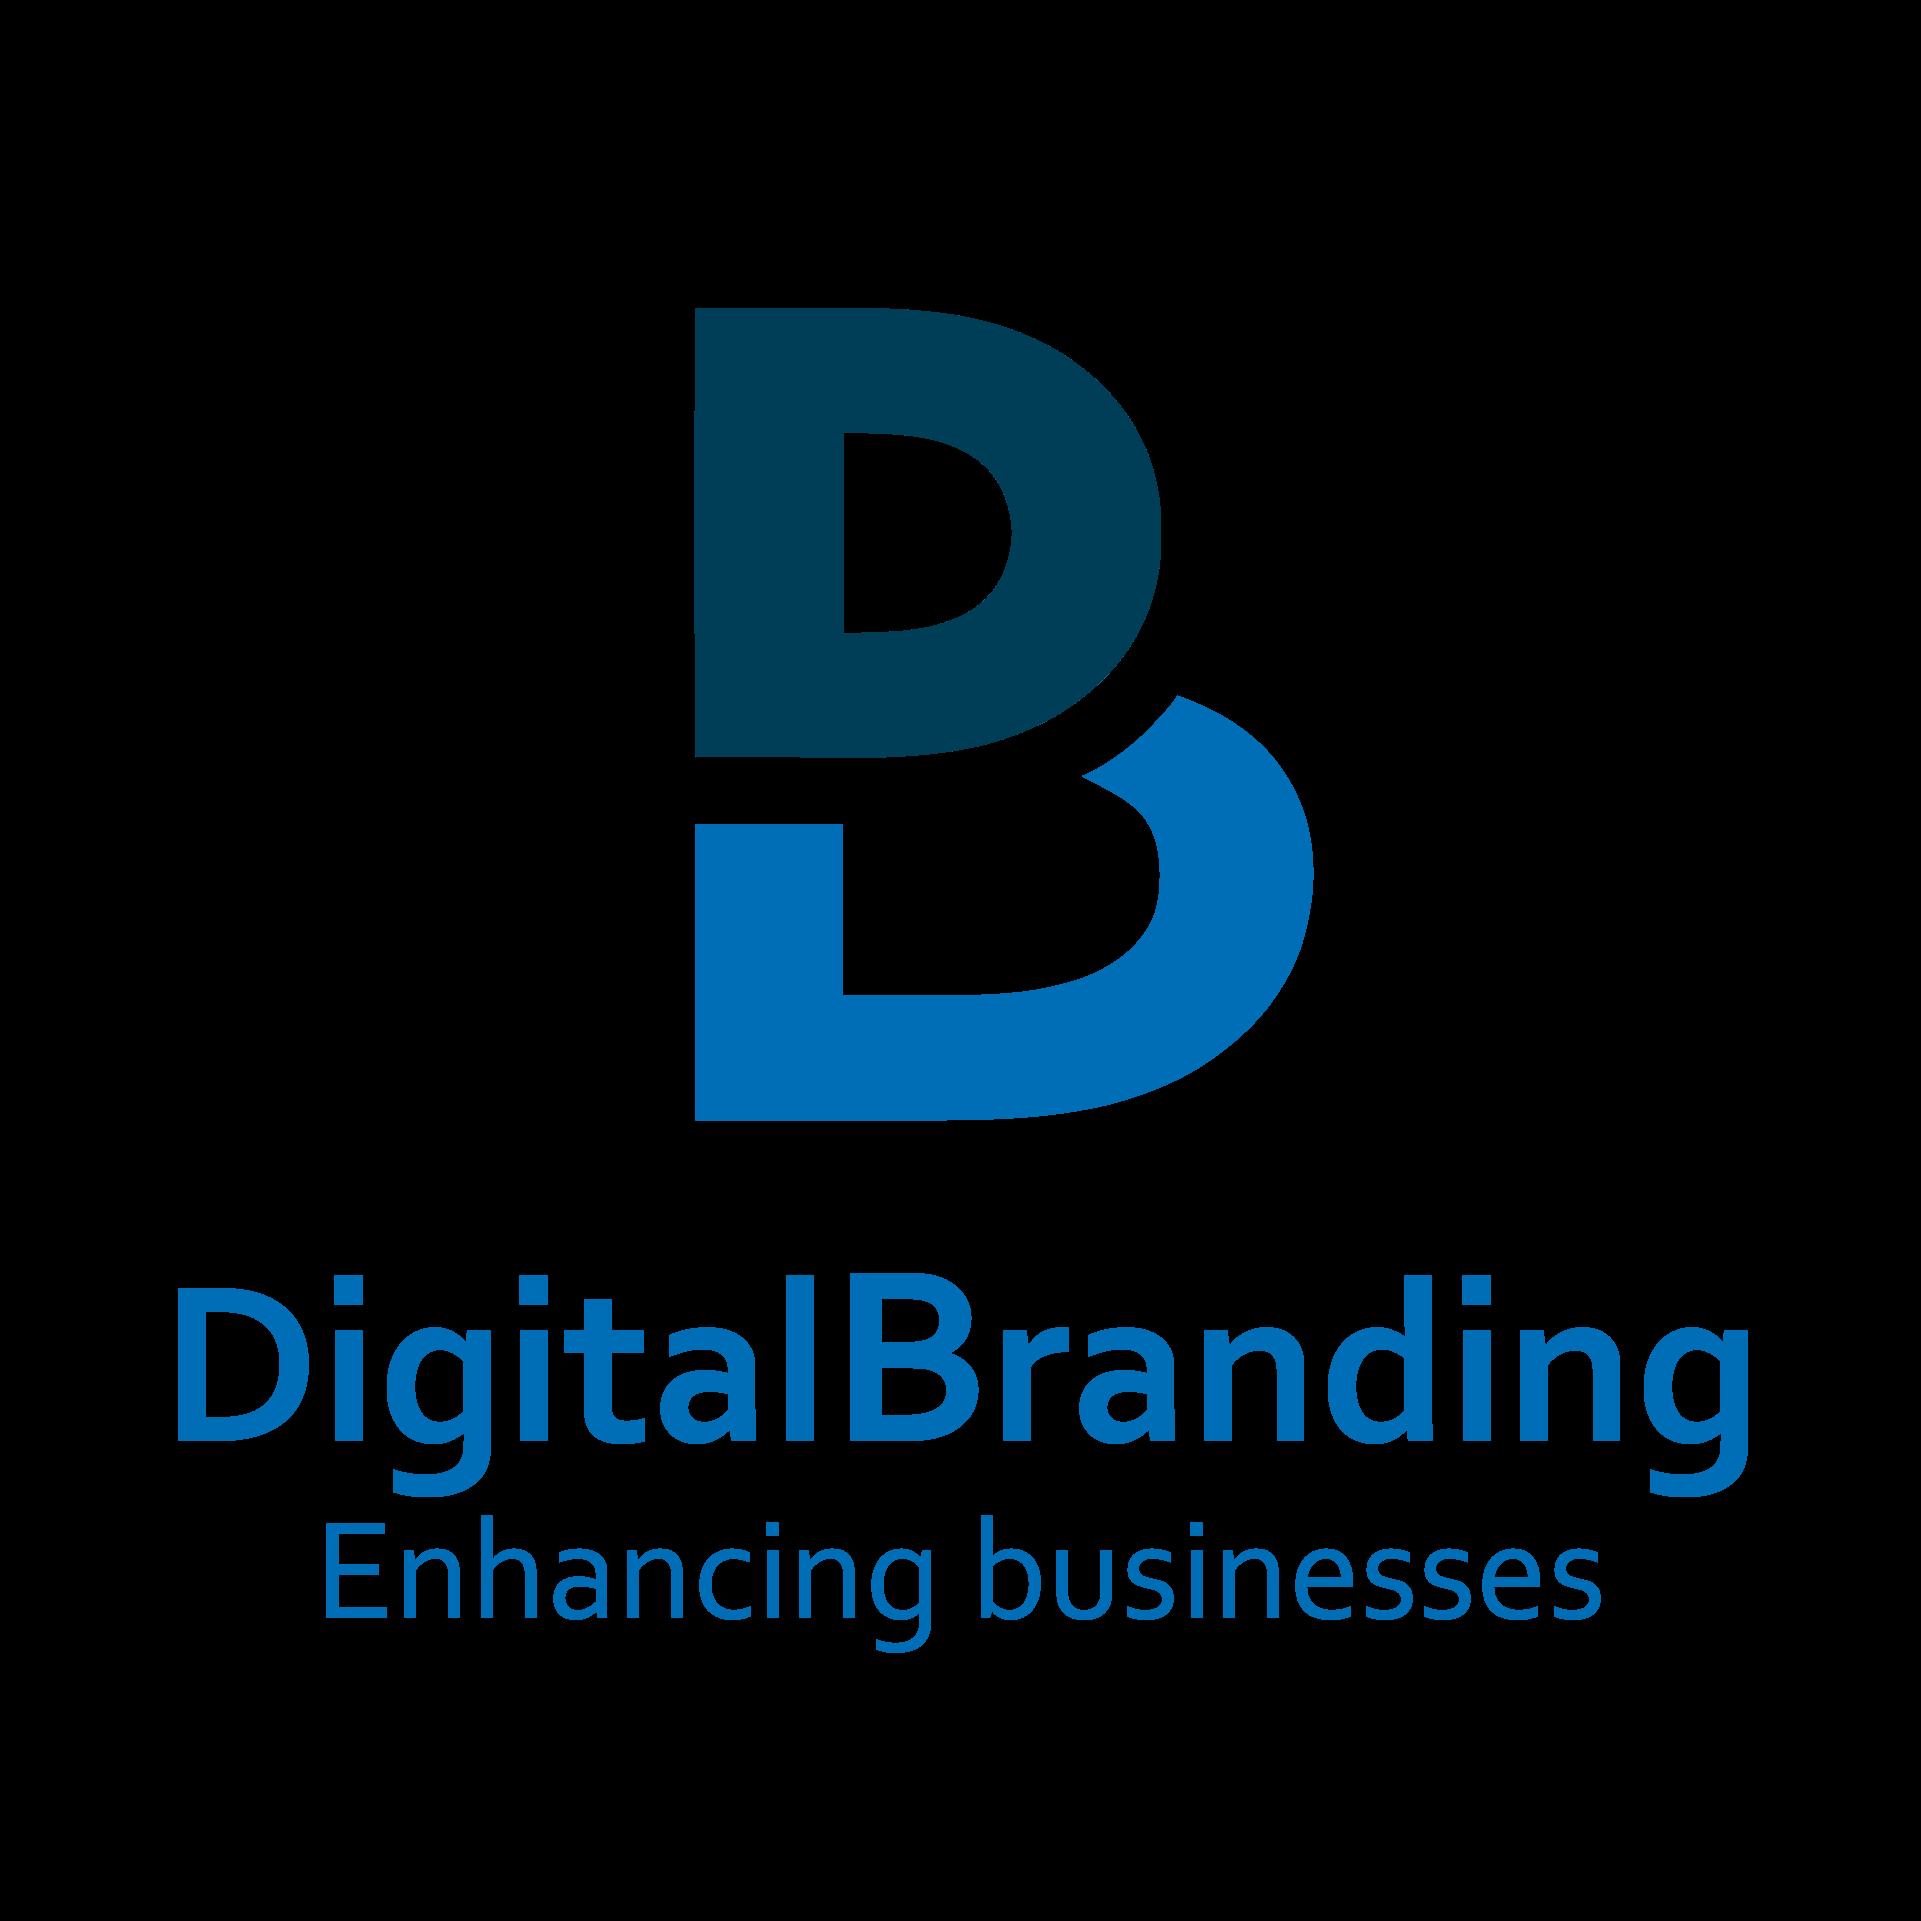 digital branding ltd cliente